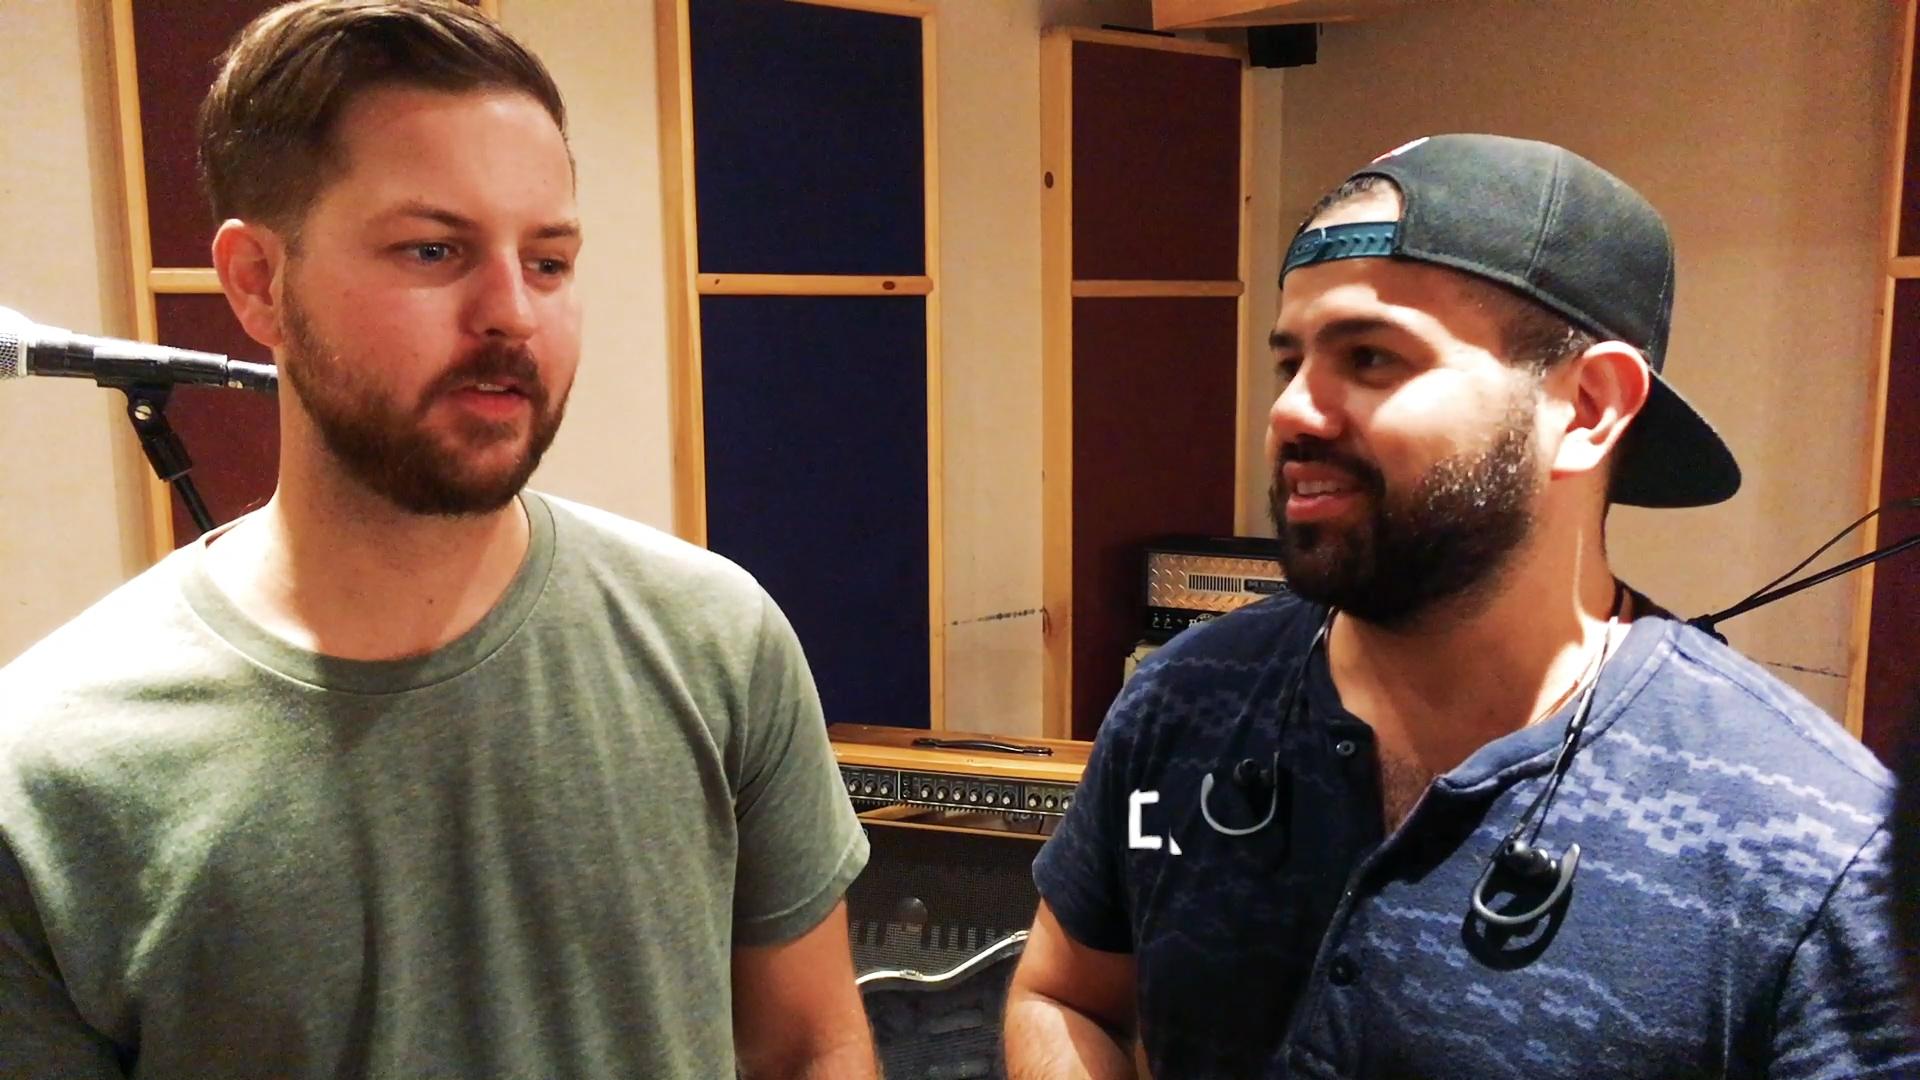 Jono Orri and Ed Cuervo of Skunkmello at Astoria Sound Works in Queens